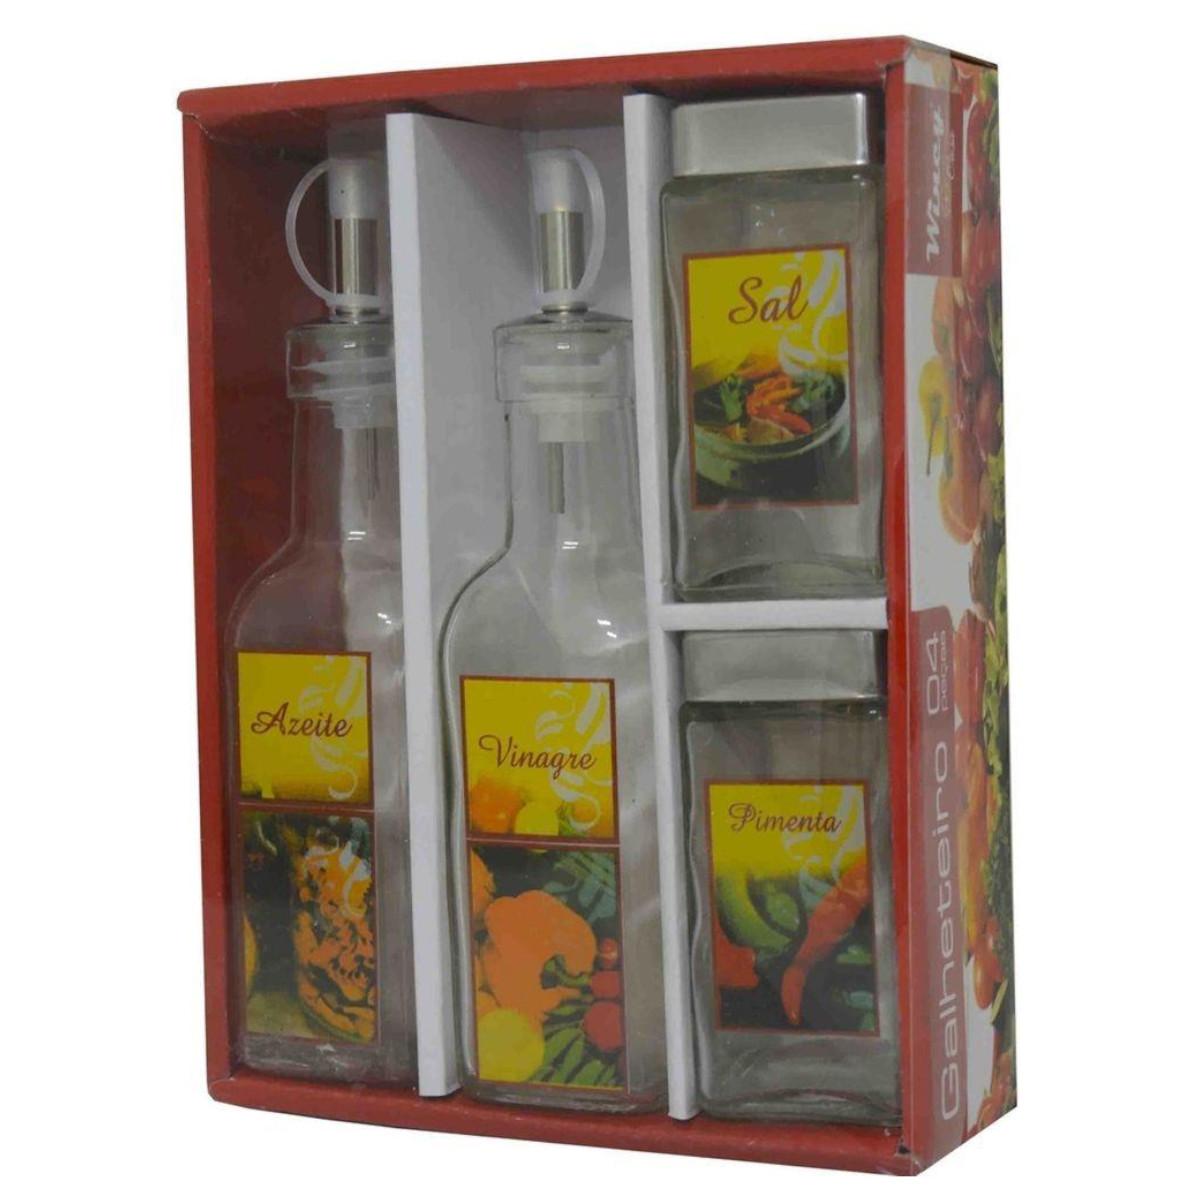 Galheteiro porta azeite vinagre sal e pimenta de vidro